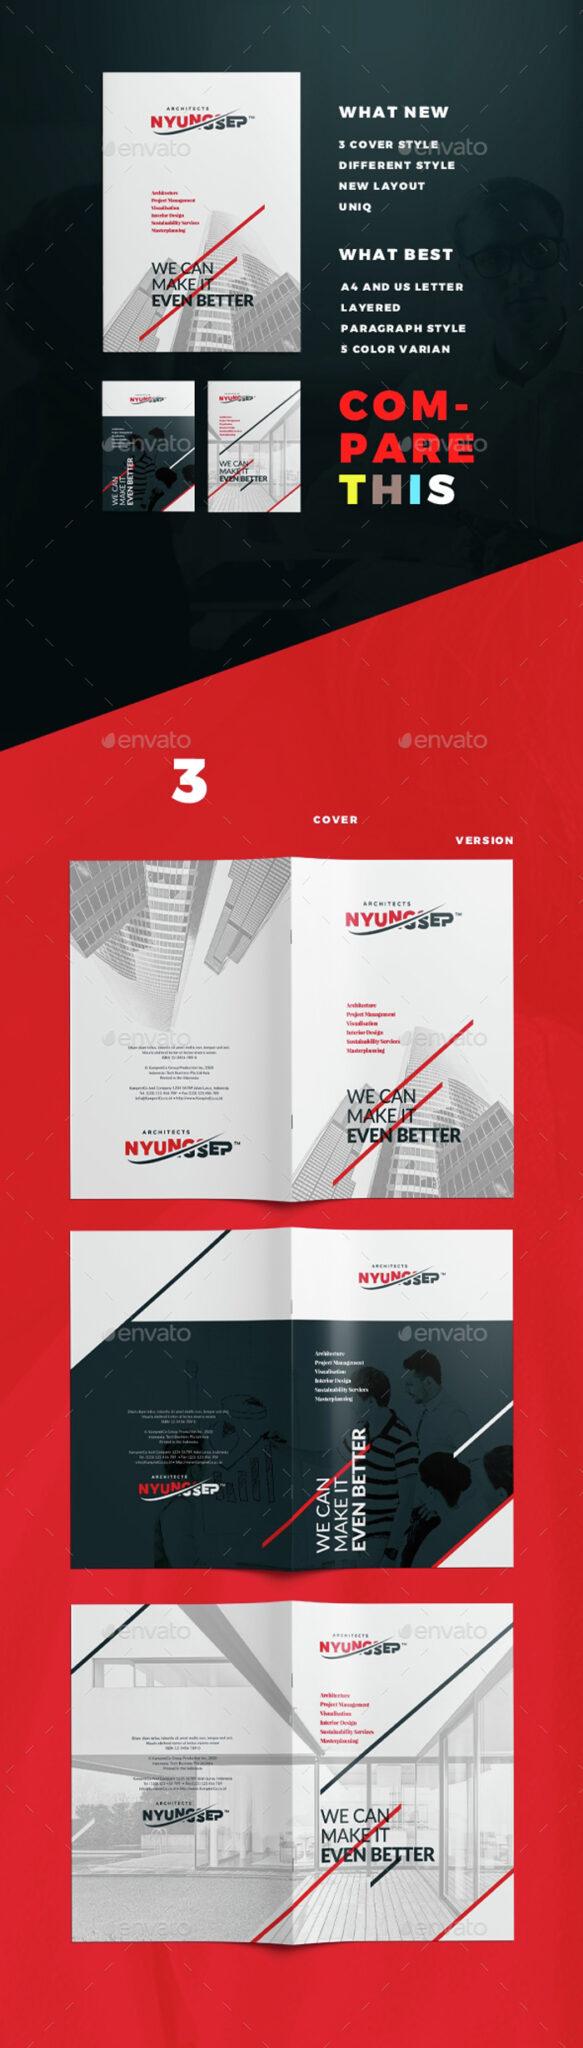 Architect-Brochure-Template 43 Plantillas de Flyer que debes descargar para tus clientes